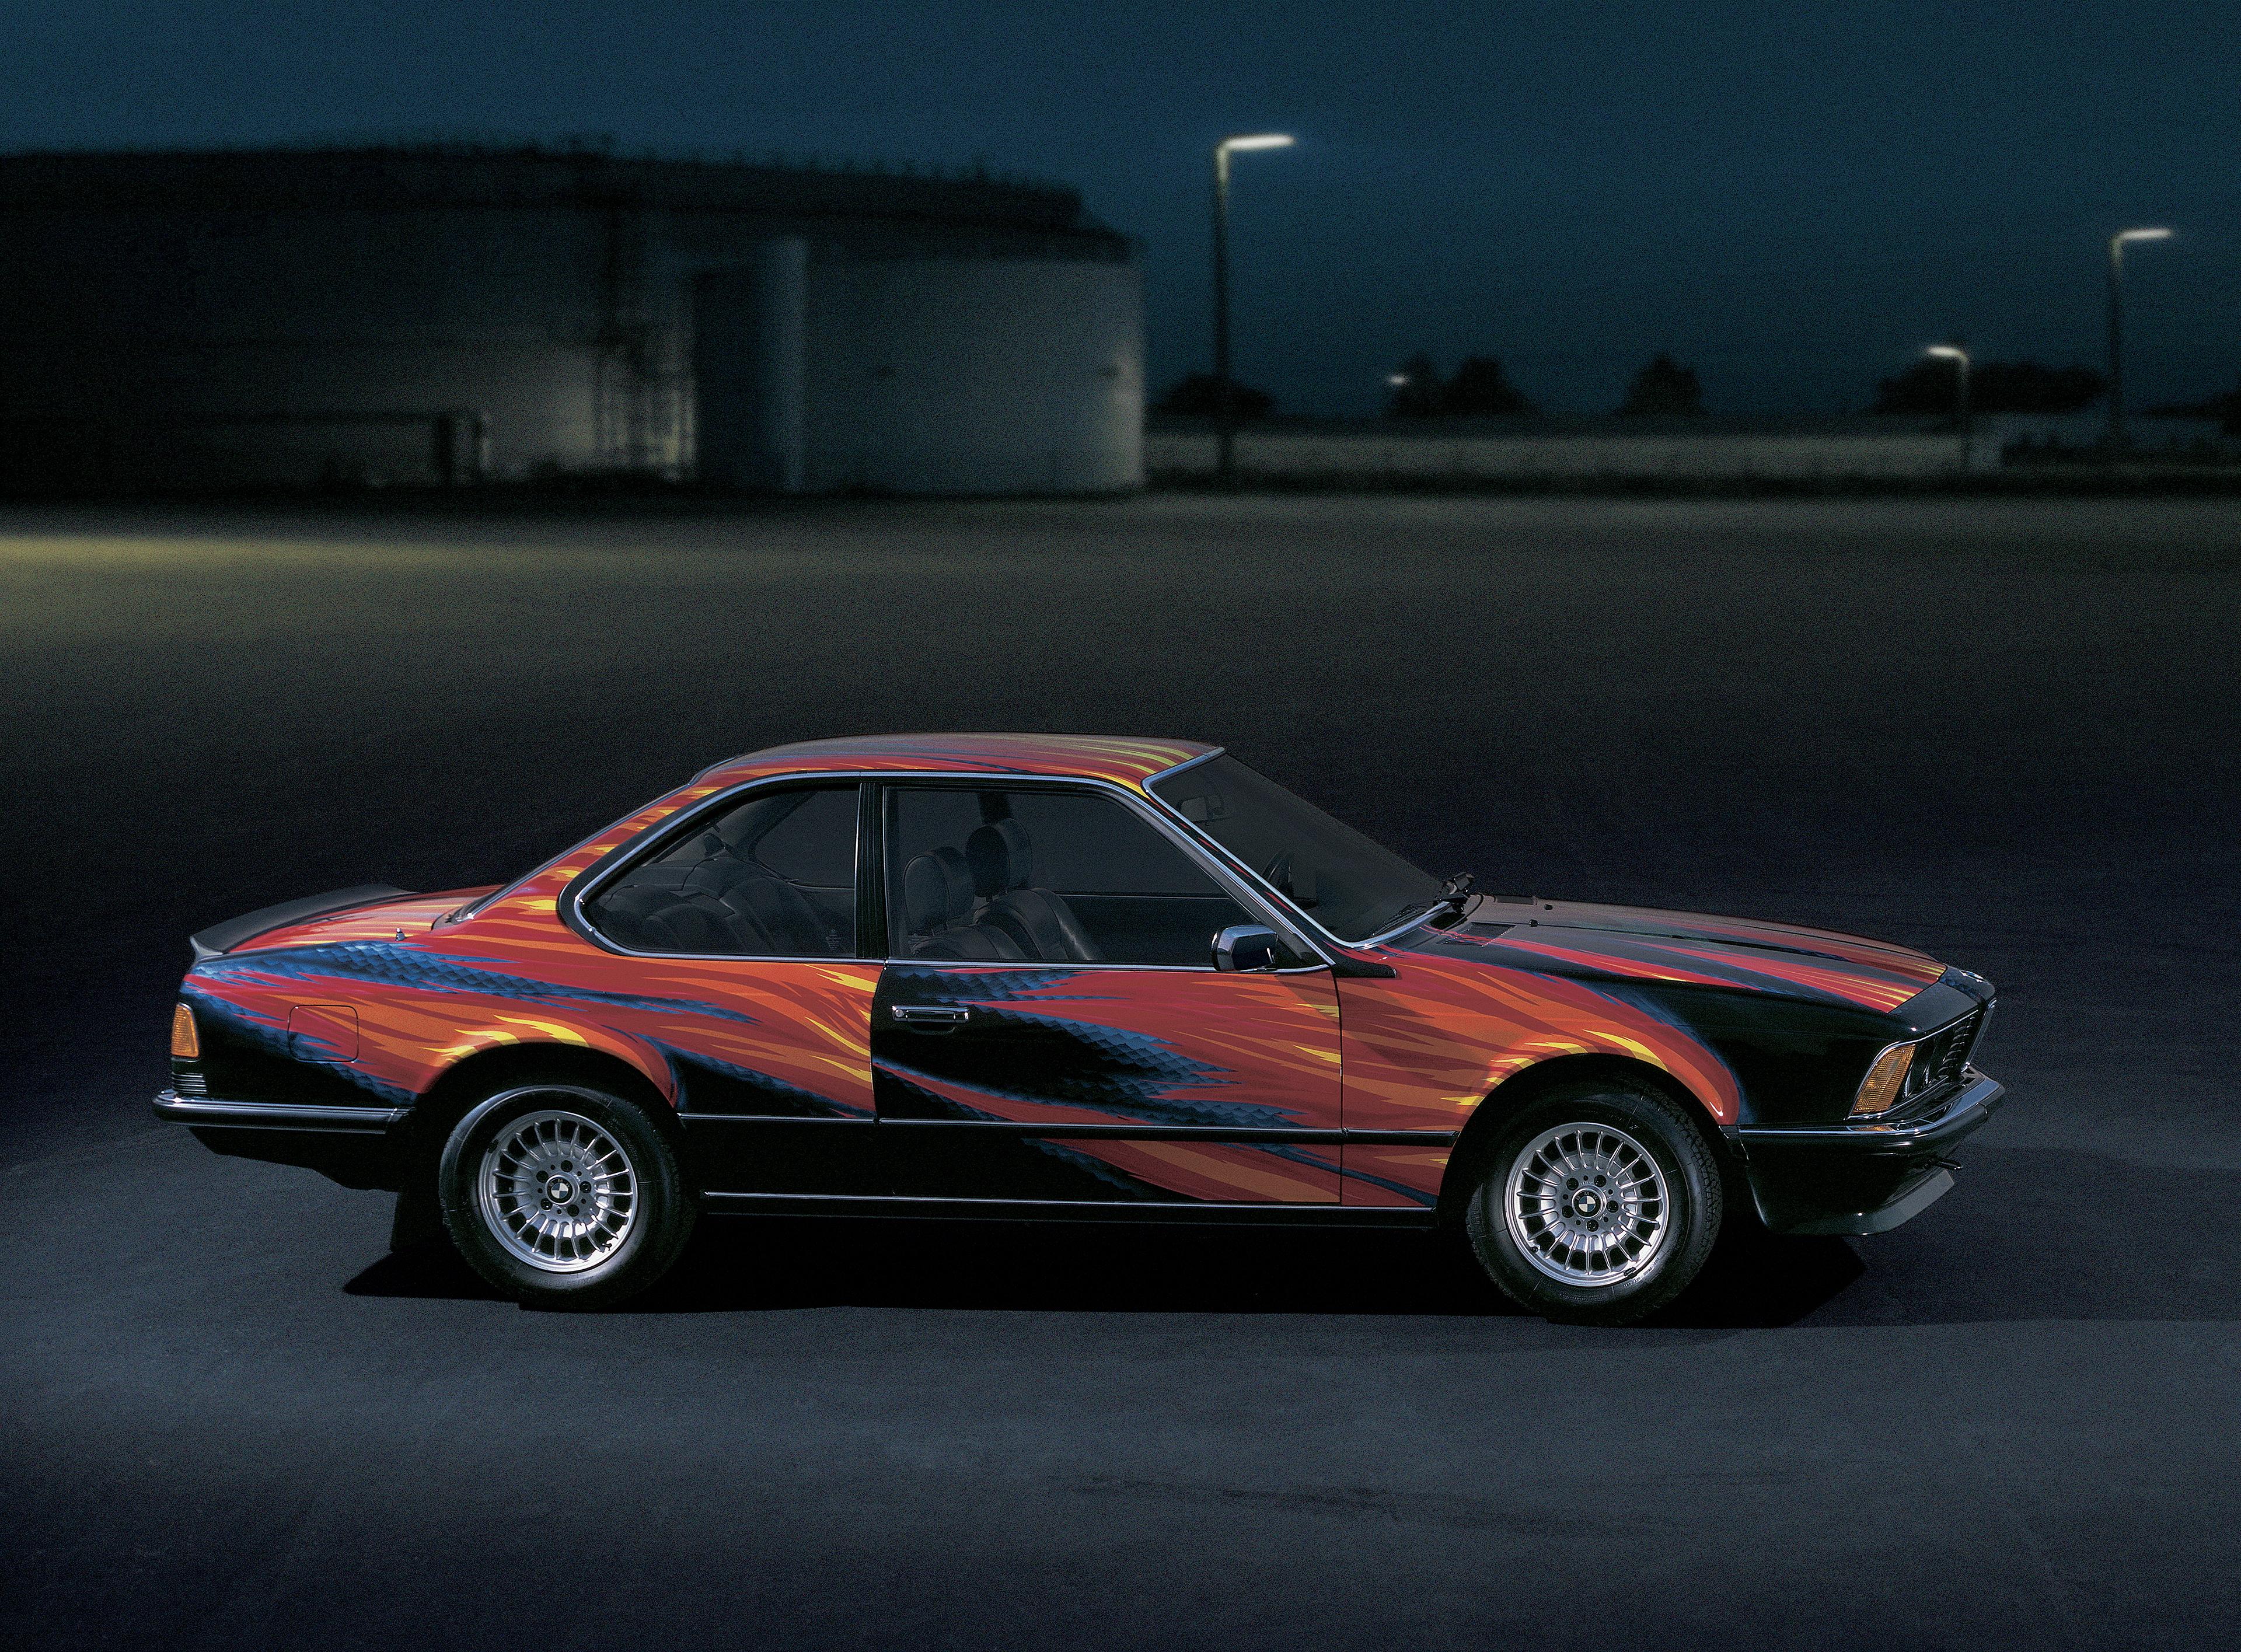 Bmw 635 Csi Art 4k Hd Cars 4k Wallpapers Images